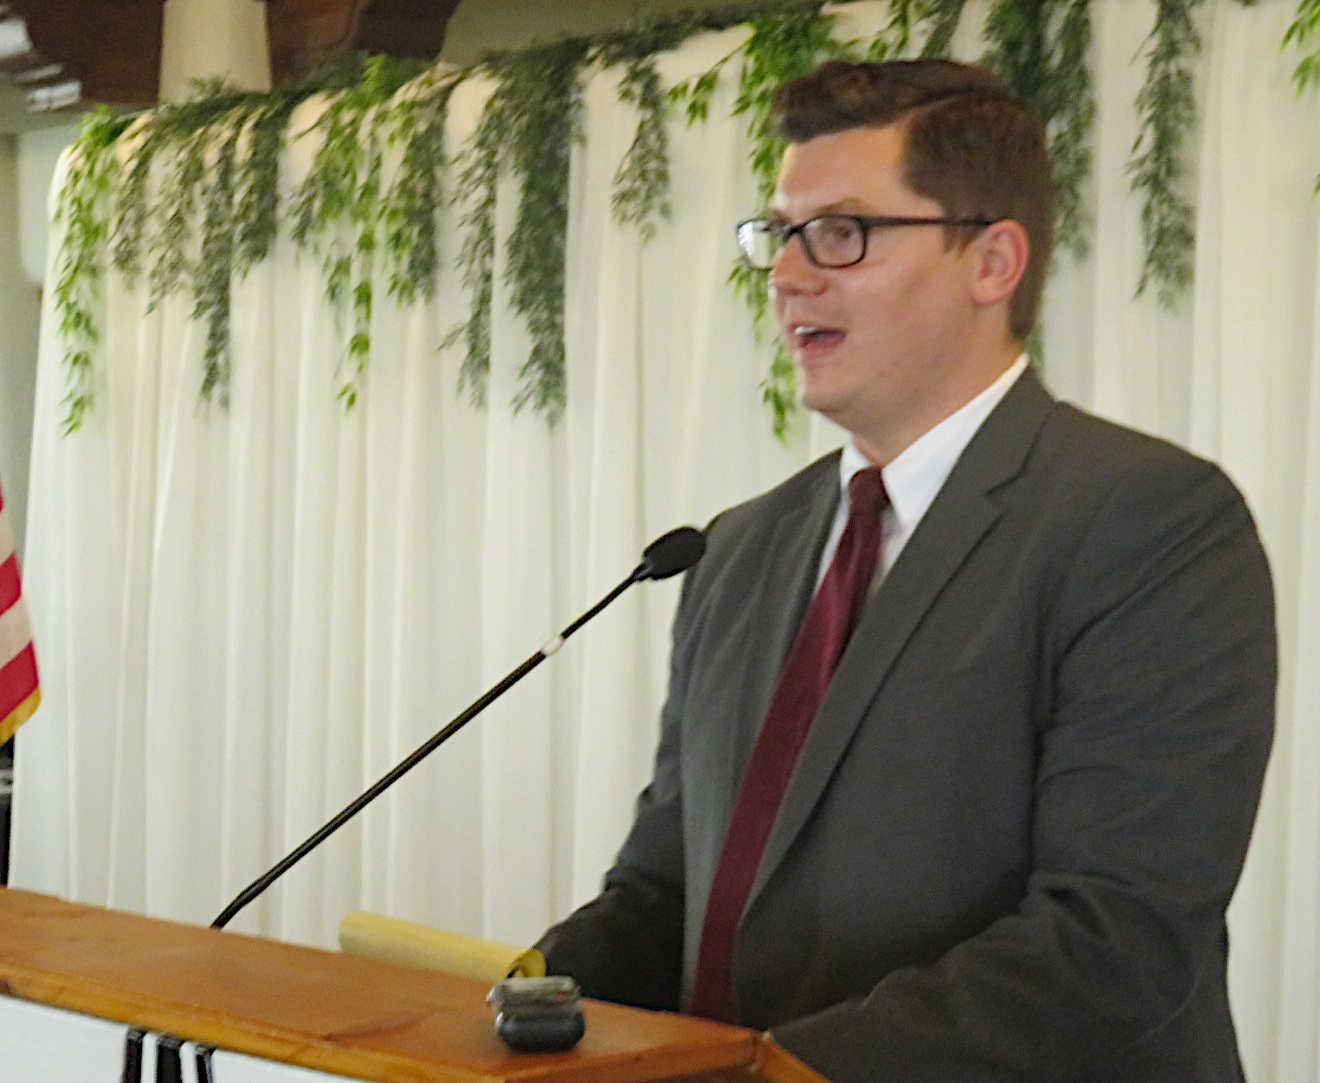 From Pachyderm: Kansas Treasurer Jake LaTurner